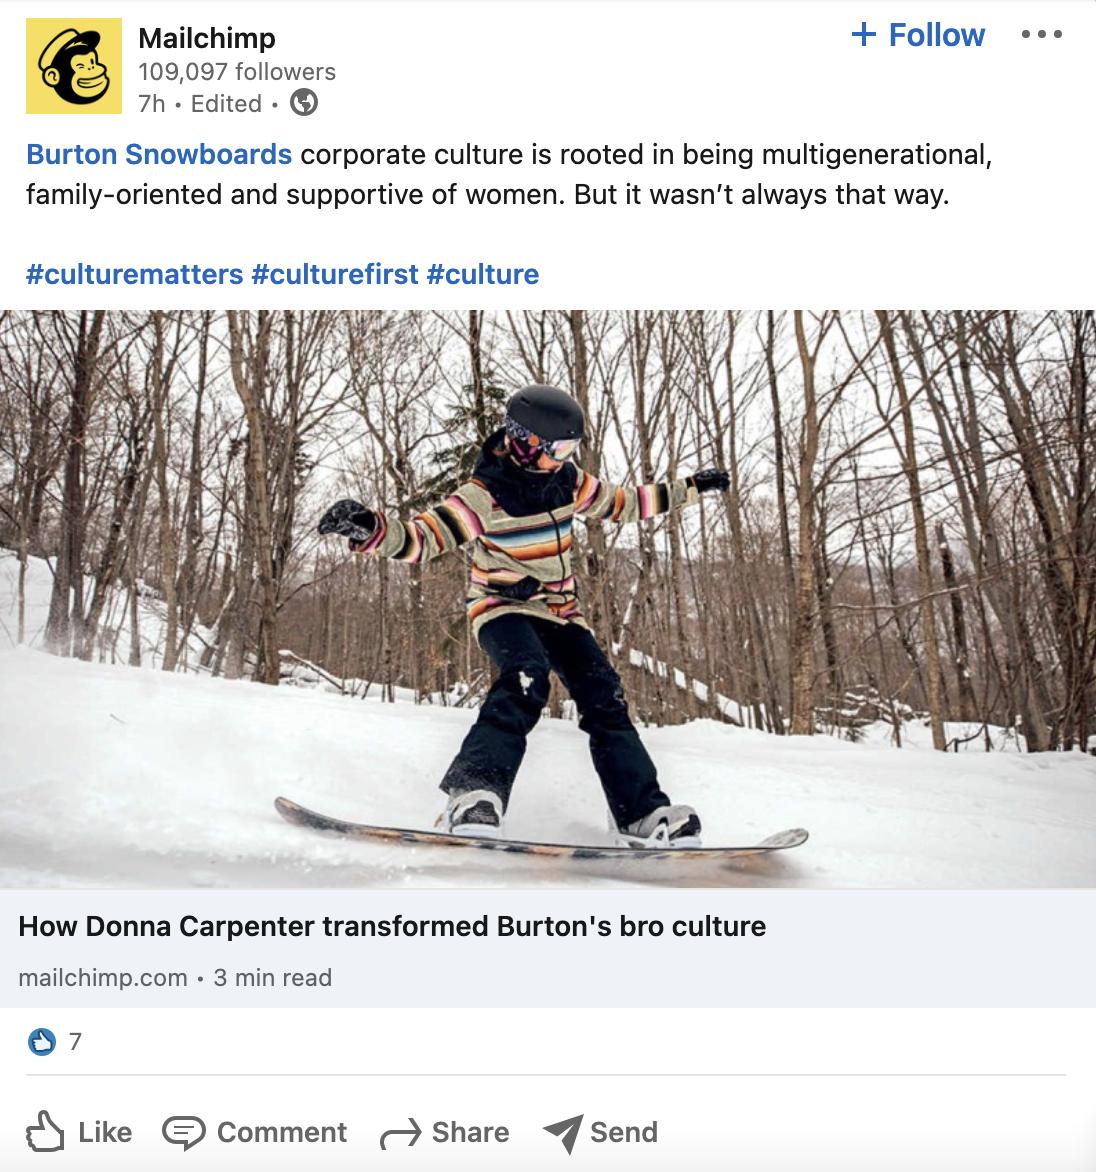 mailchimp linkedin post featuring snowboarder